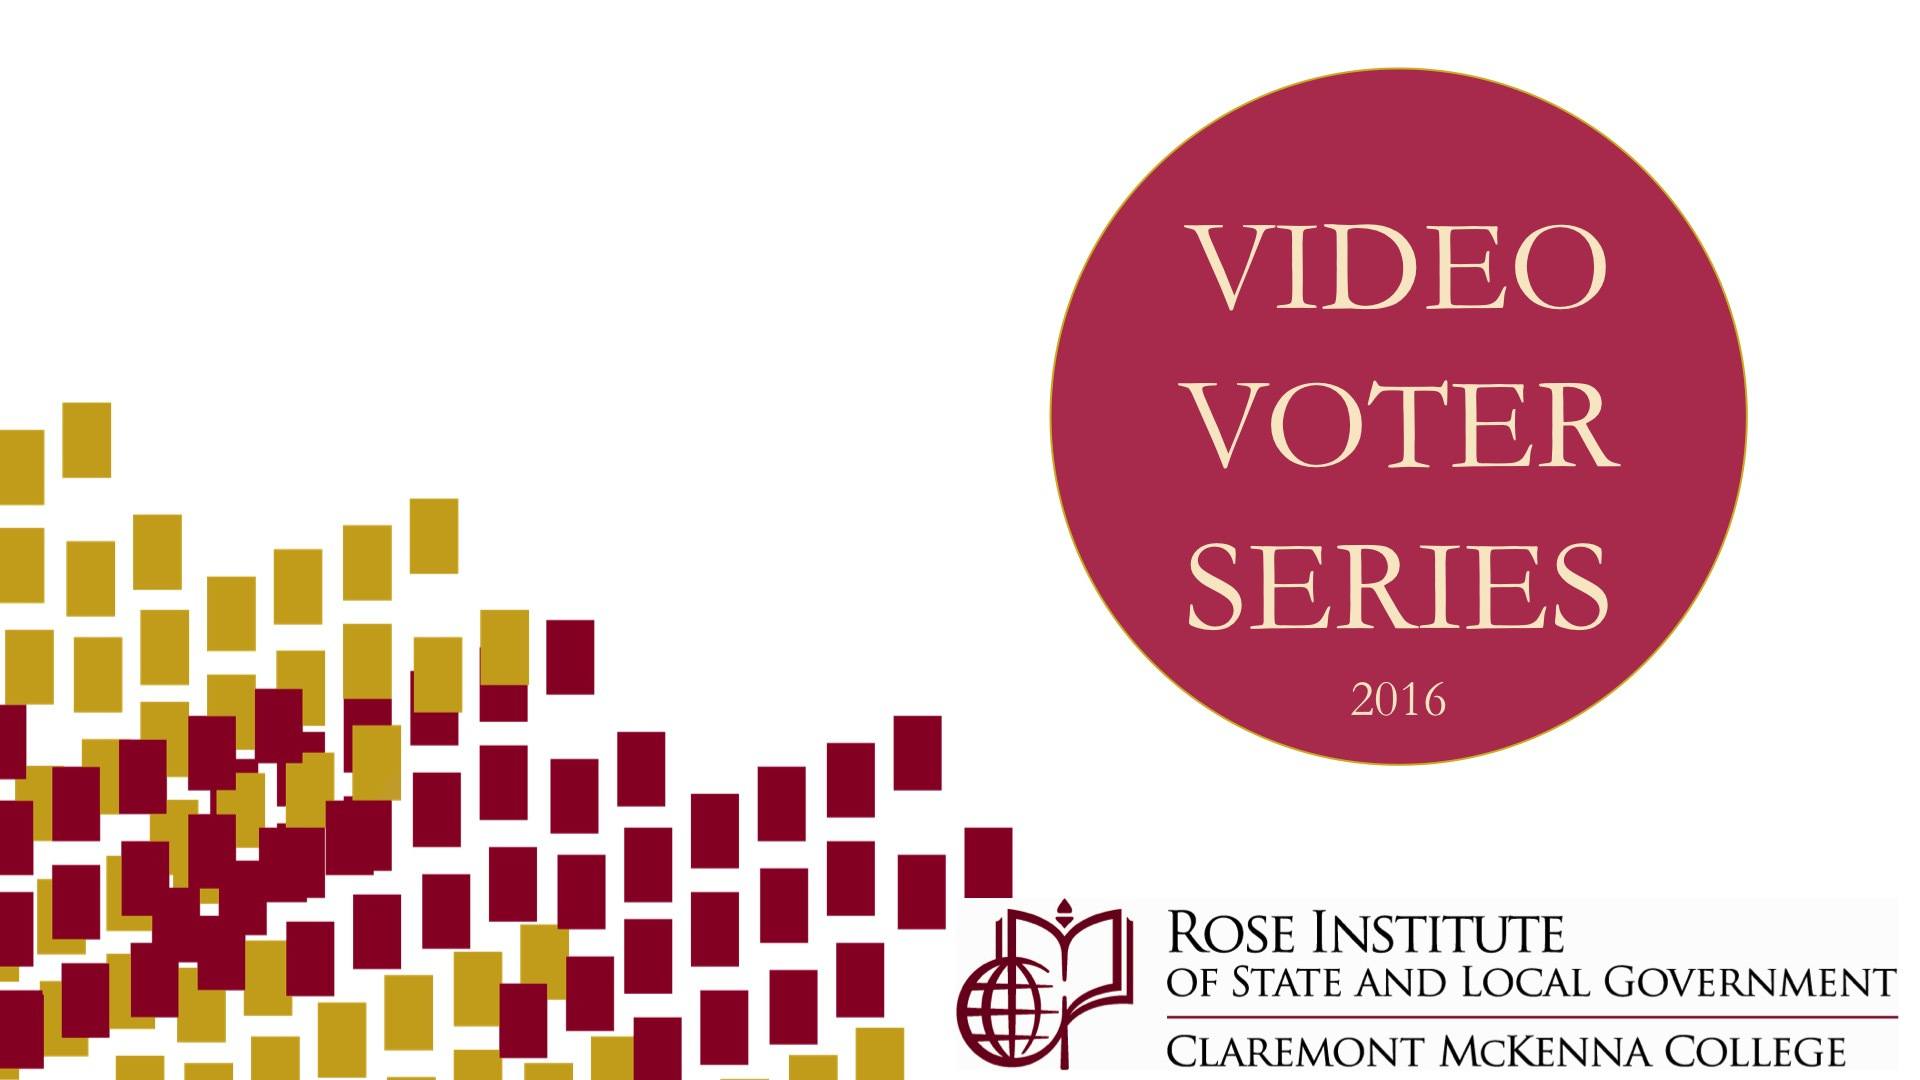 Video Voter Series splash screen